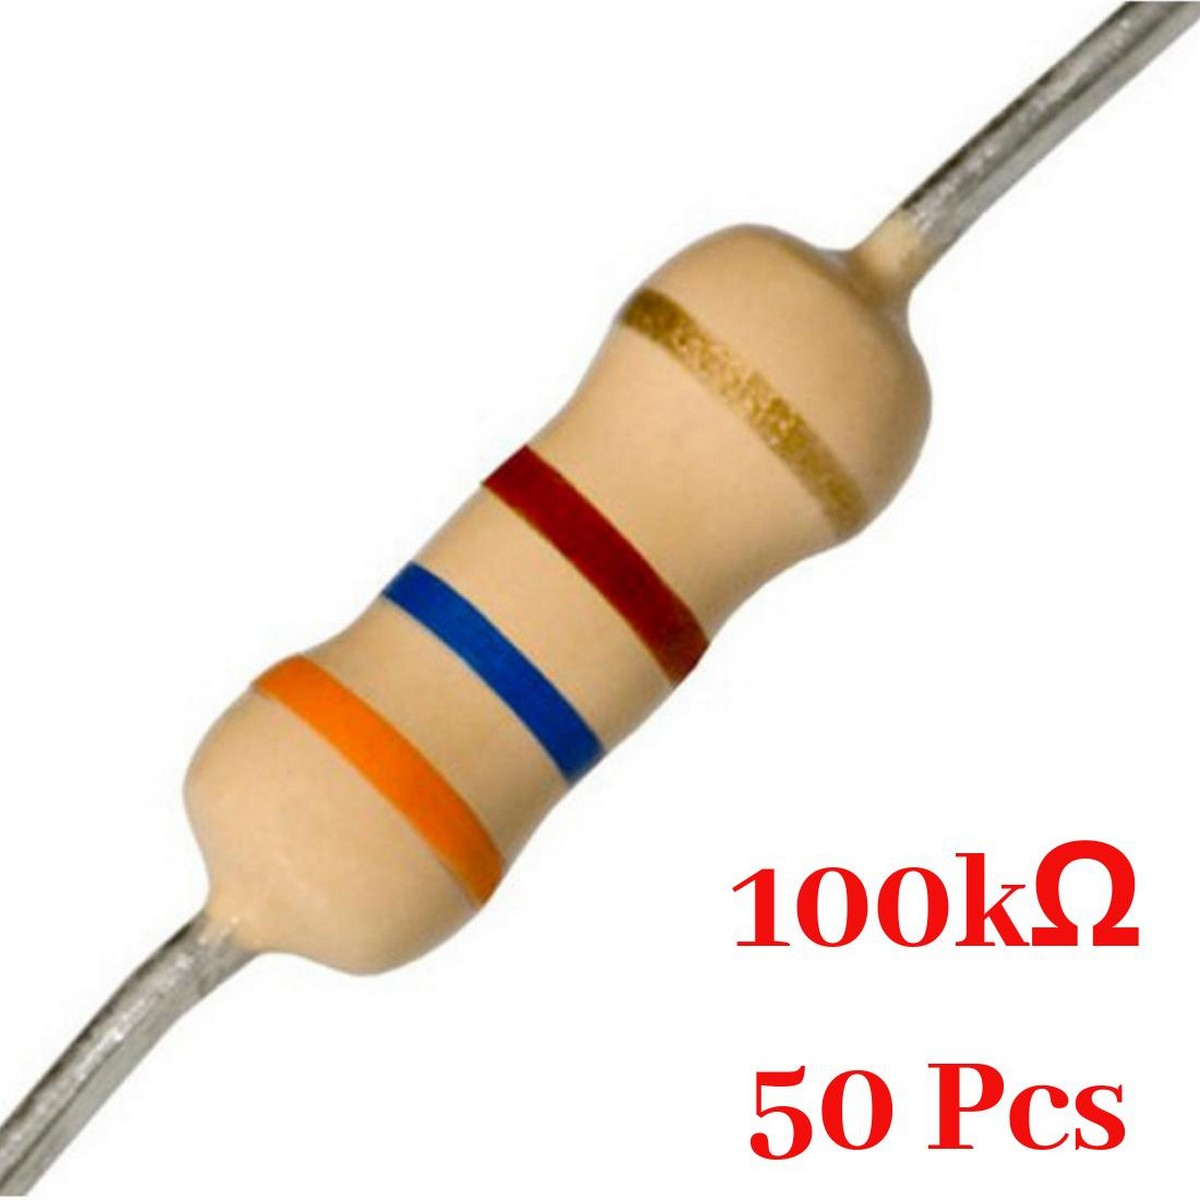 50 Pcs- 100K Ohm resistor